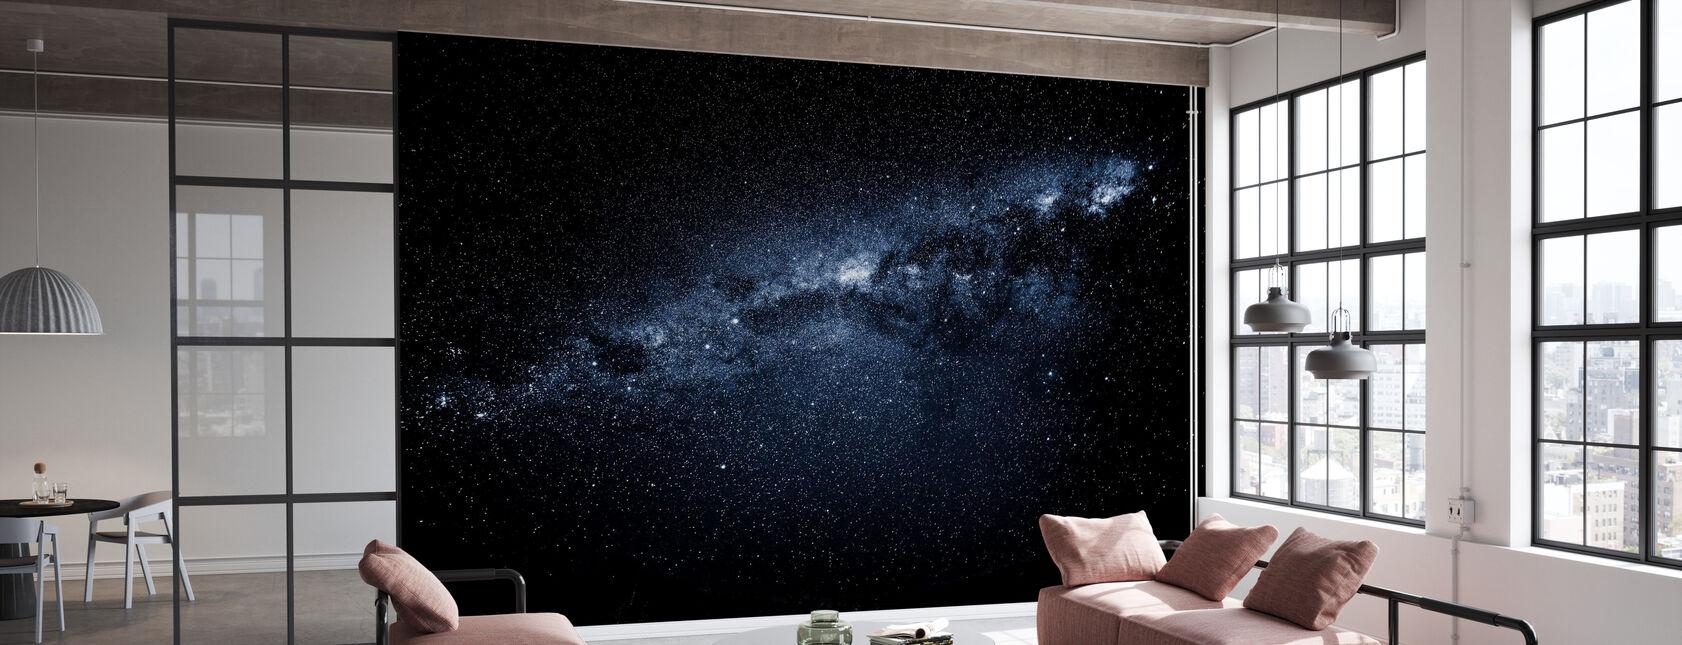 Milky Way - Wallpaper - Office